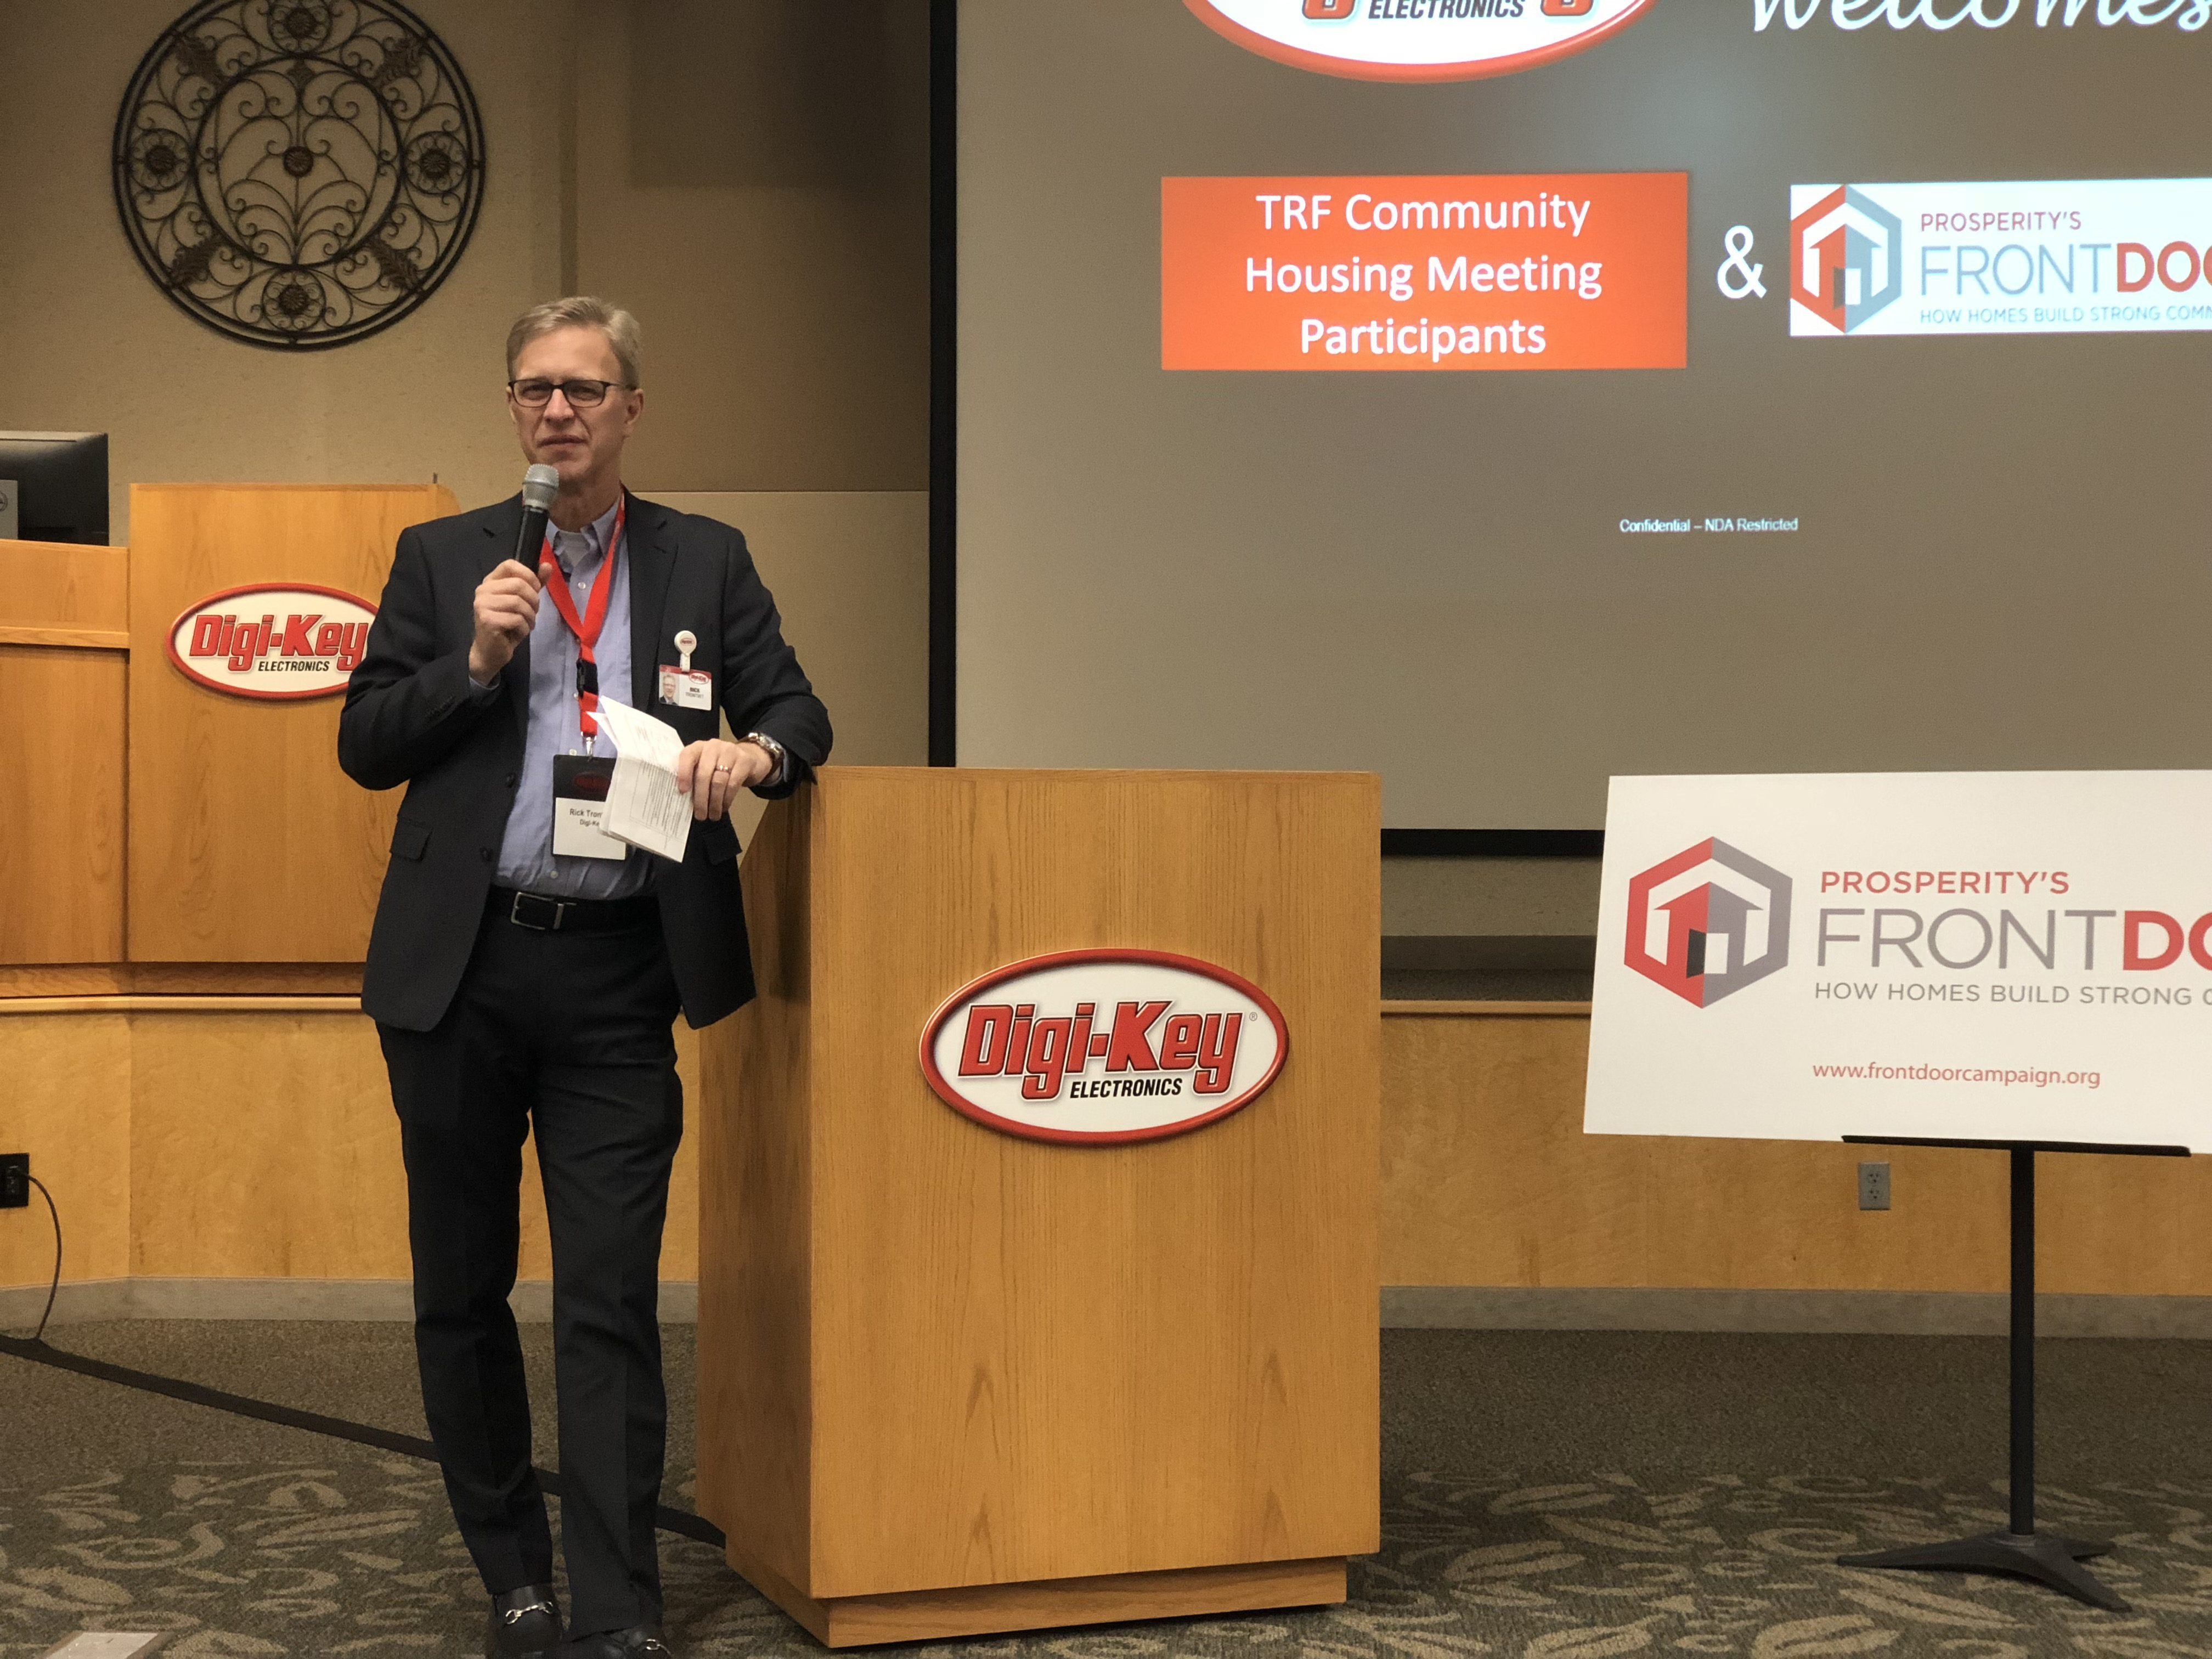 Rick Trontvet, Vice President, Digi-Key, Housing development in Thief River Falls, Minnesota